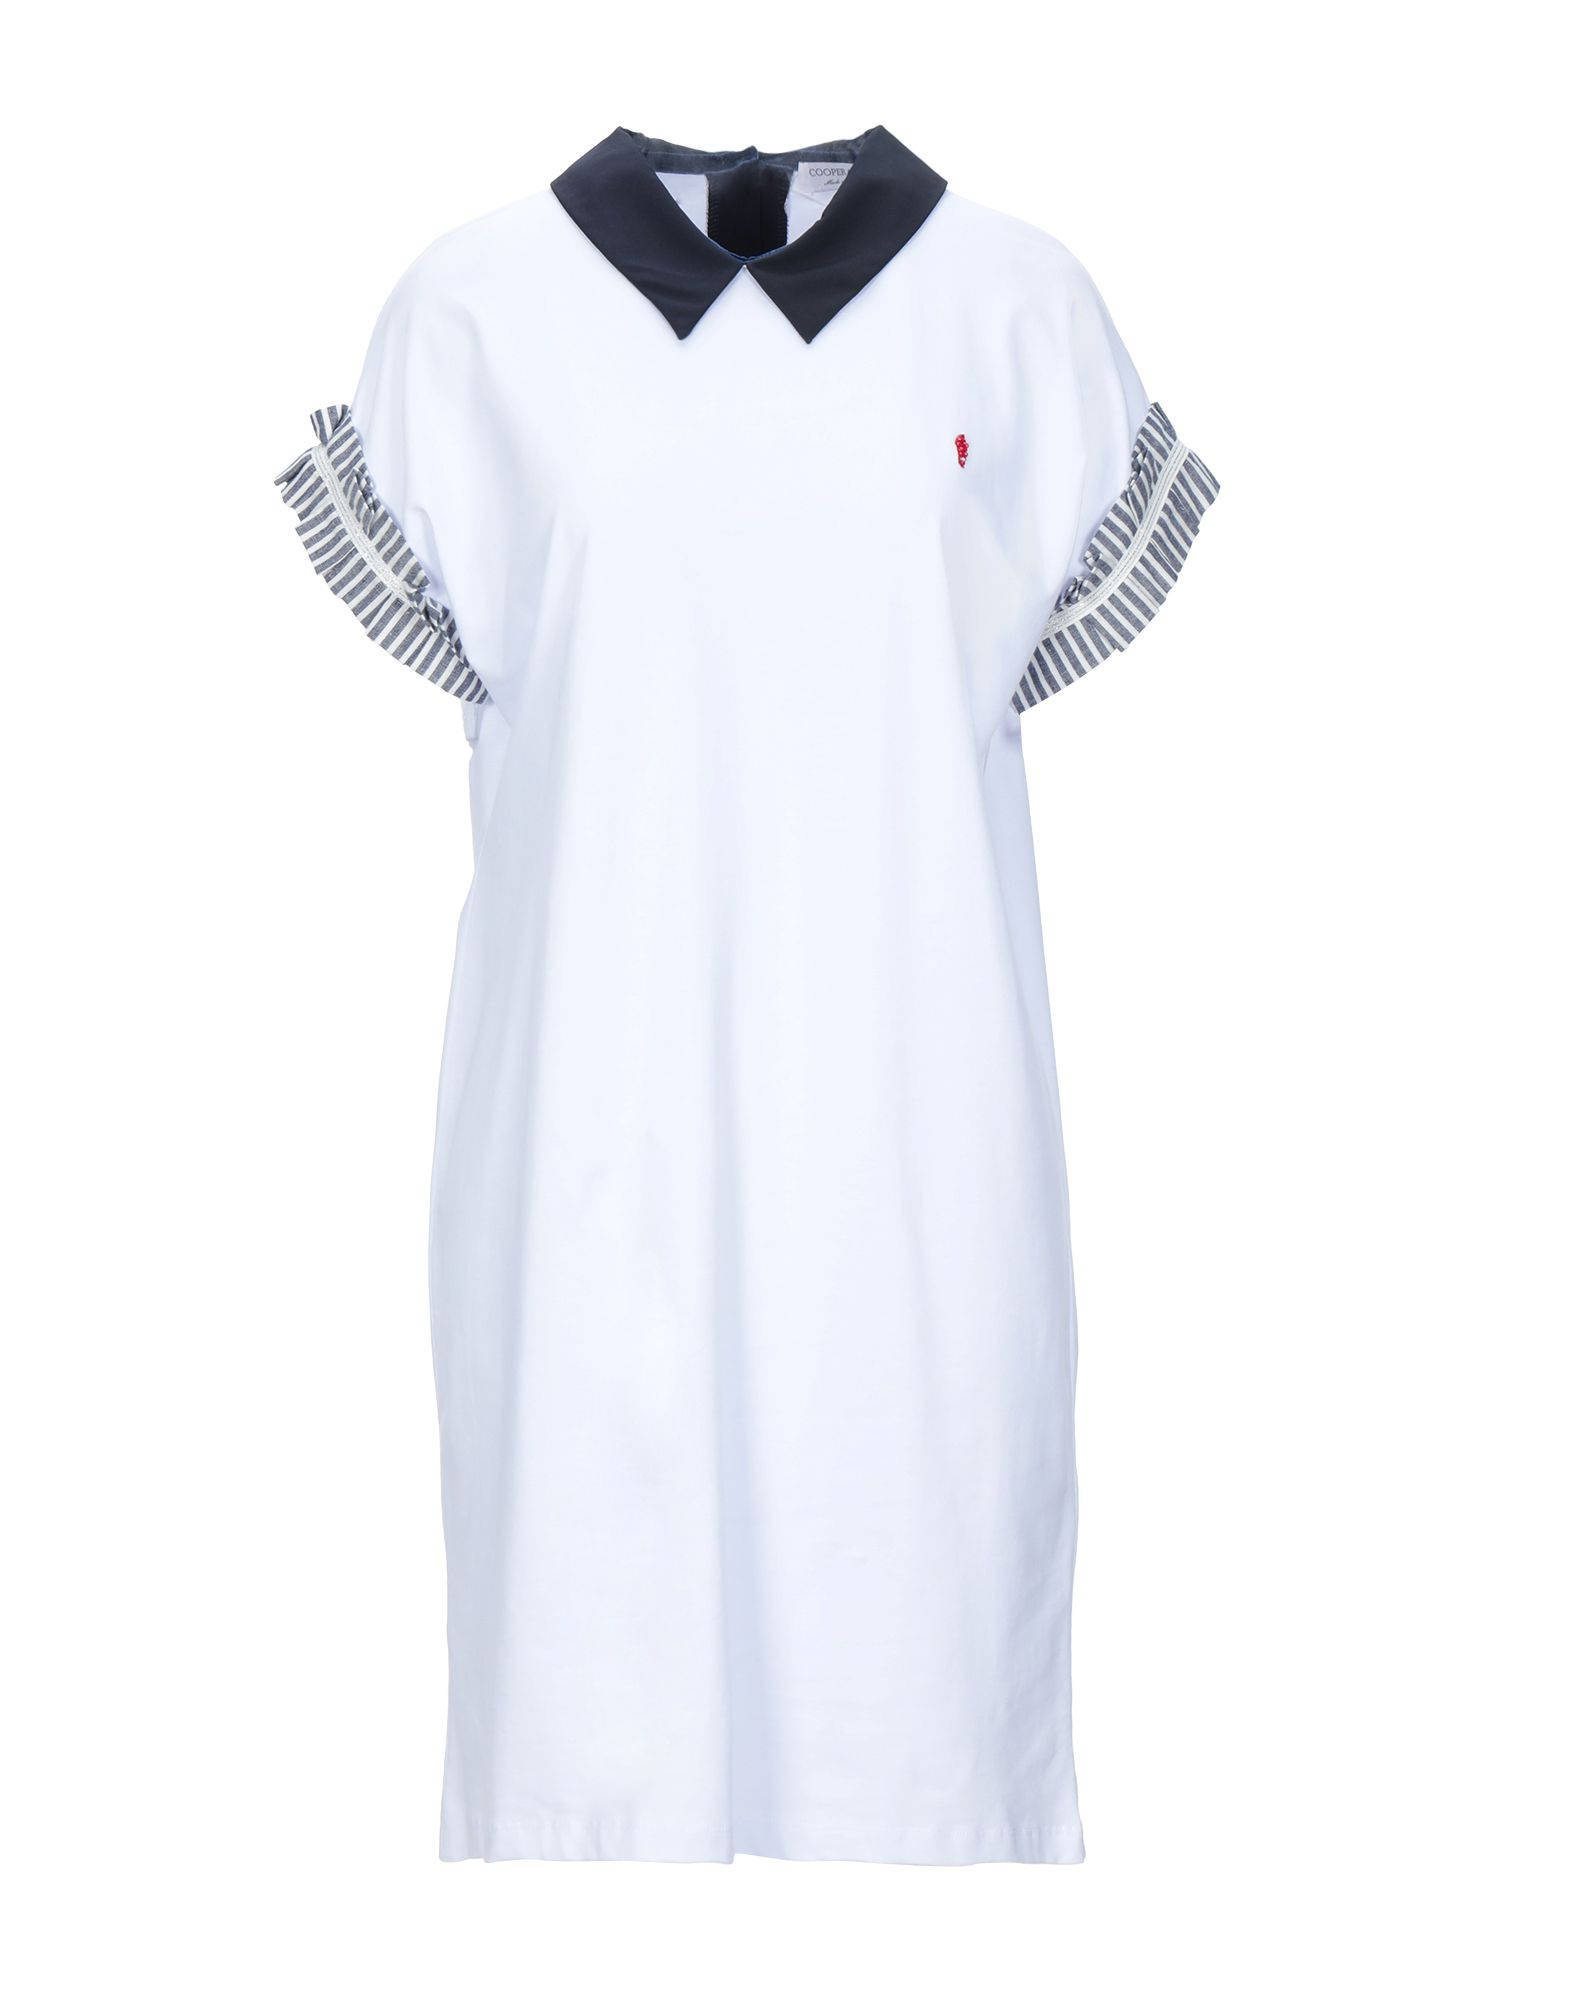 COOPERATIVA PESCATORI POSILLIPO Короткое платье